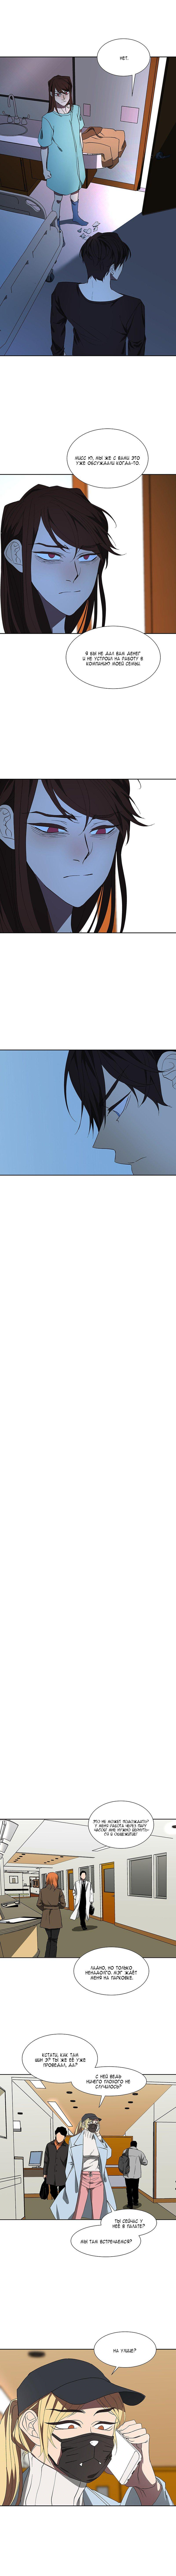 Манга Я люблю Ю / I love Yoo  - Том 1 Глава 66 Страница 11